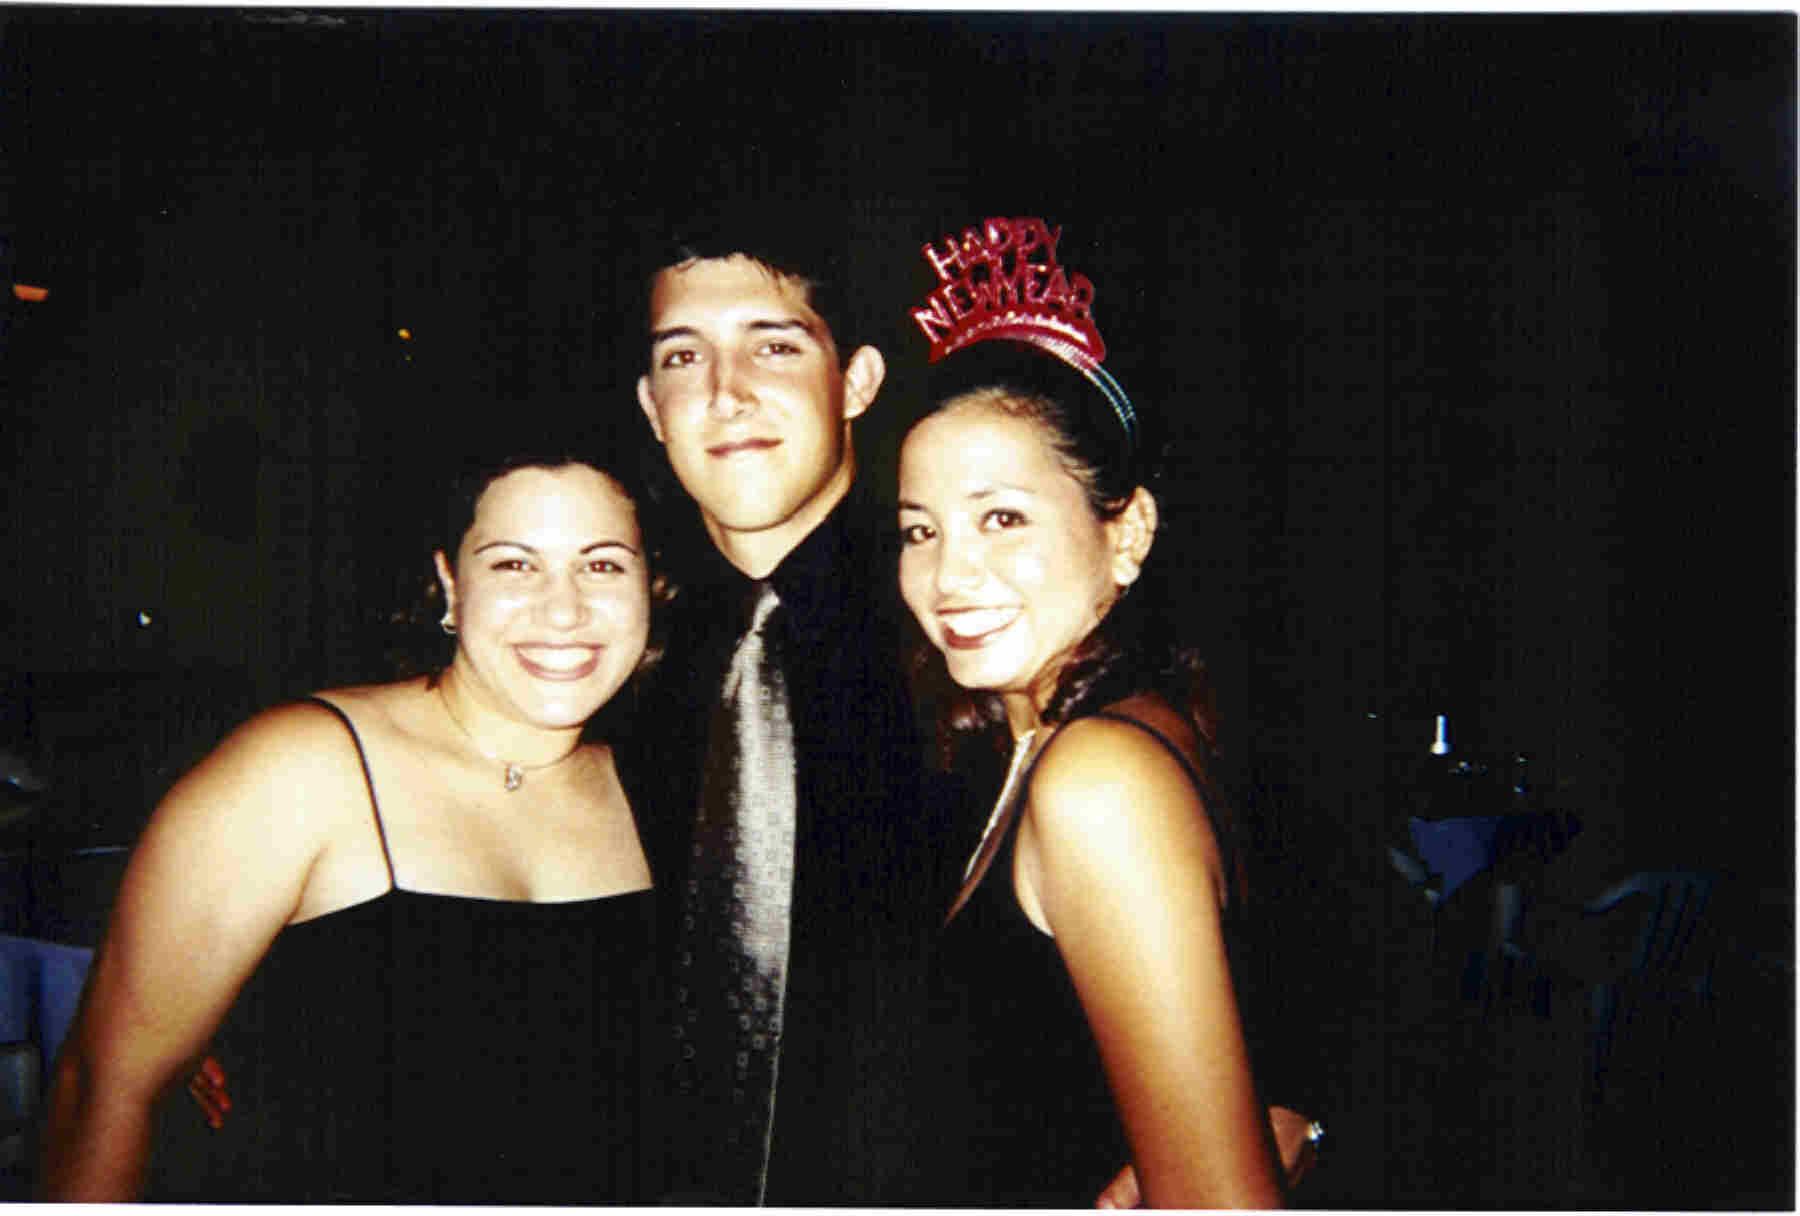 Natalie, Me, and Sacha